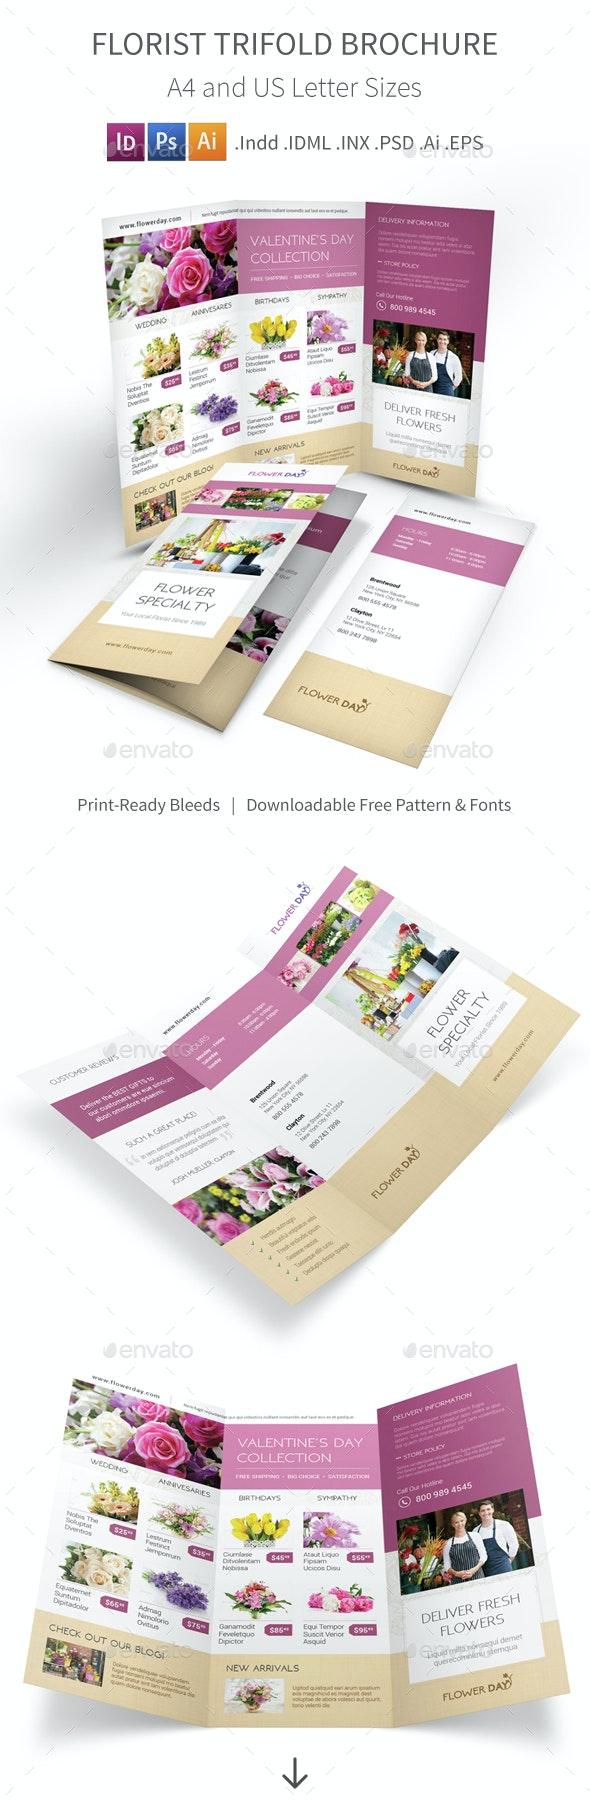 Florist Trifold Brochure 2 - Informational Brochures